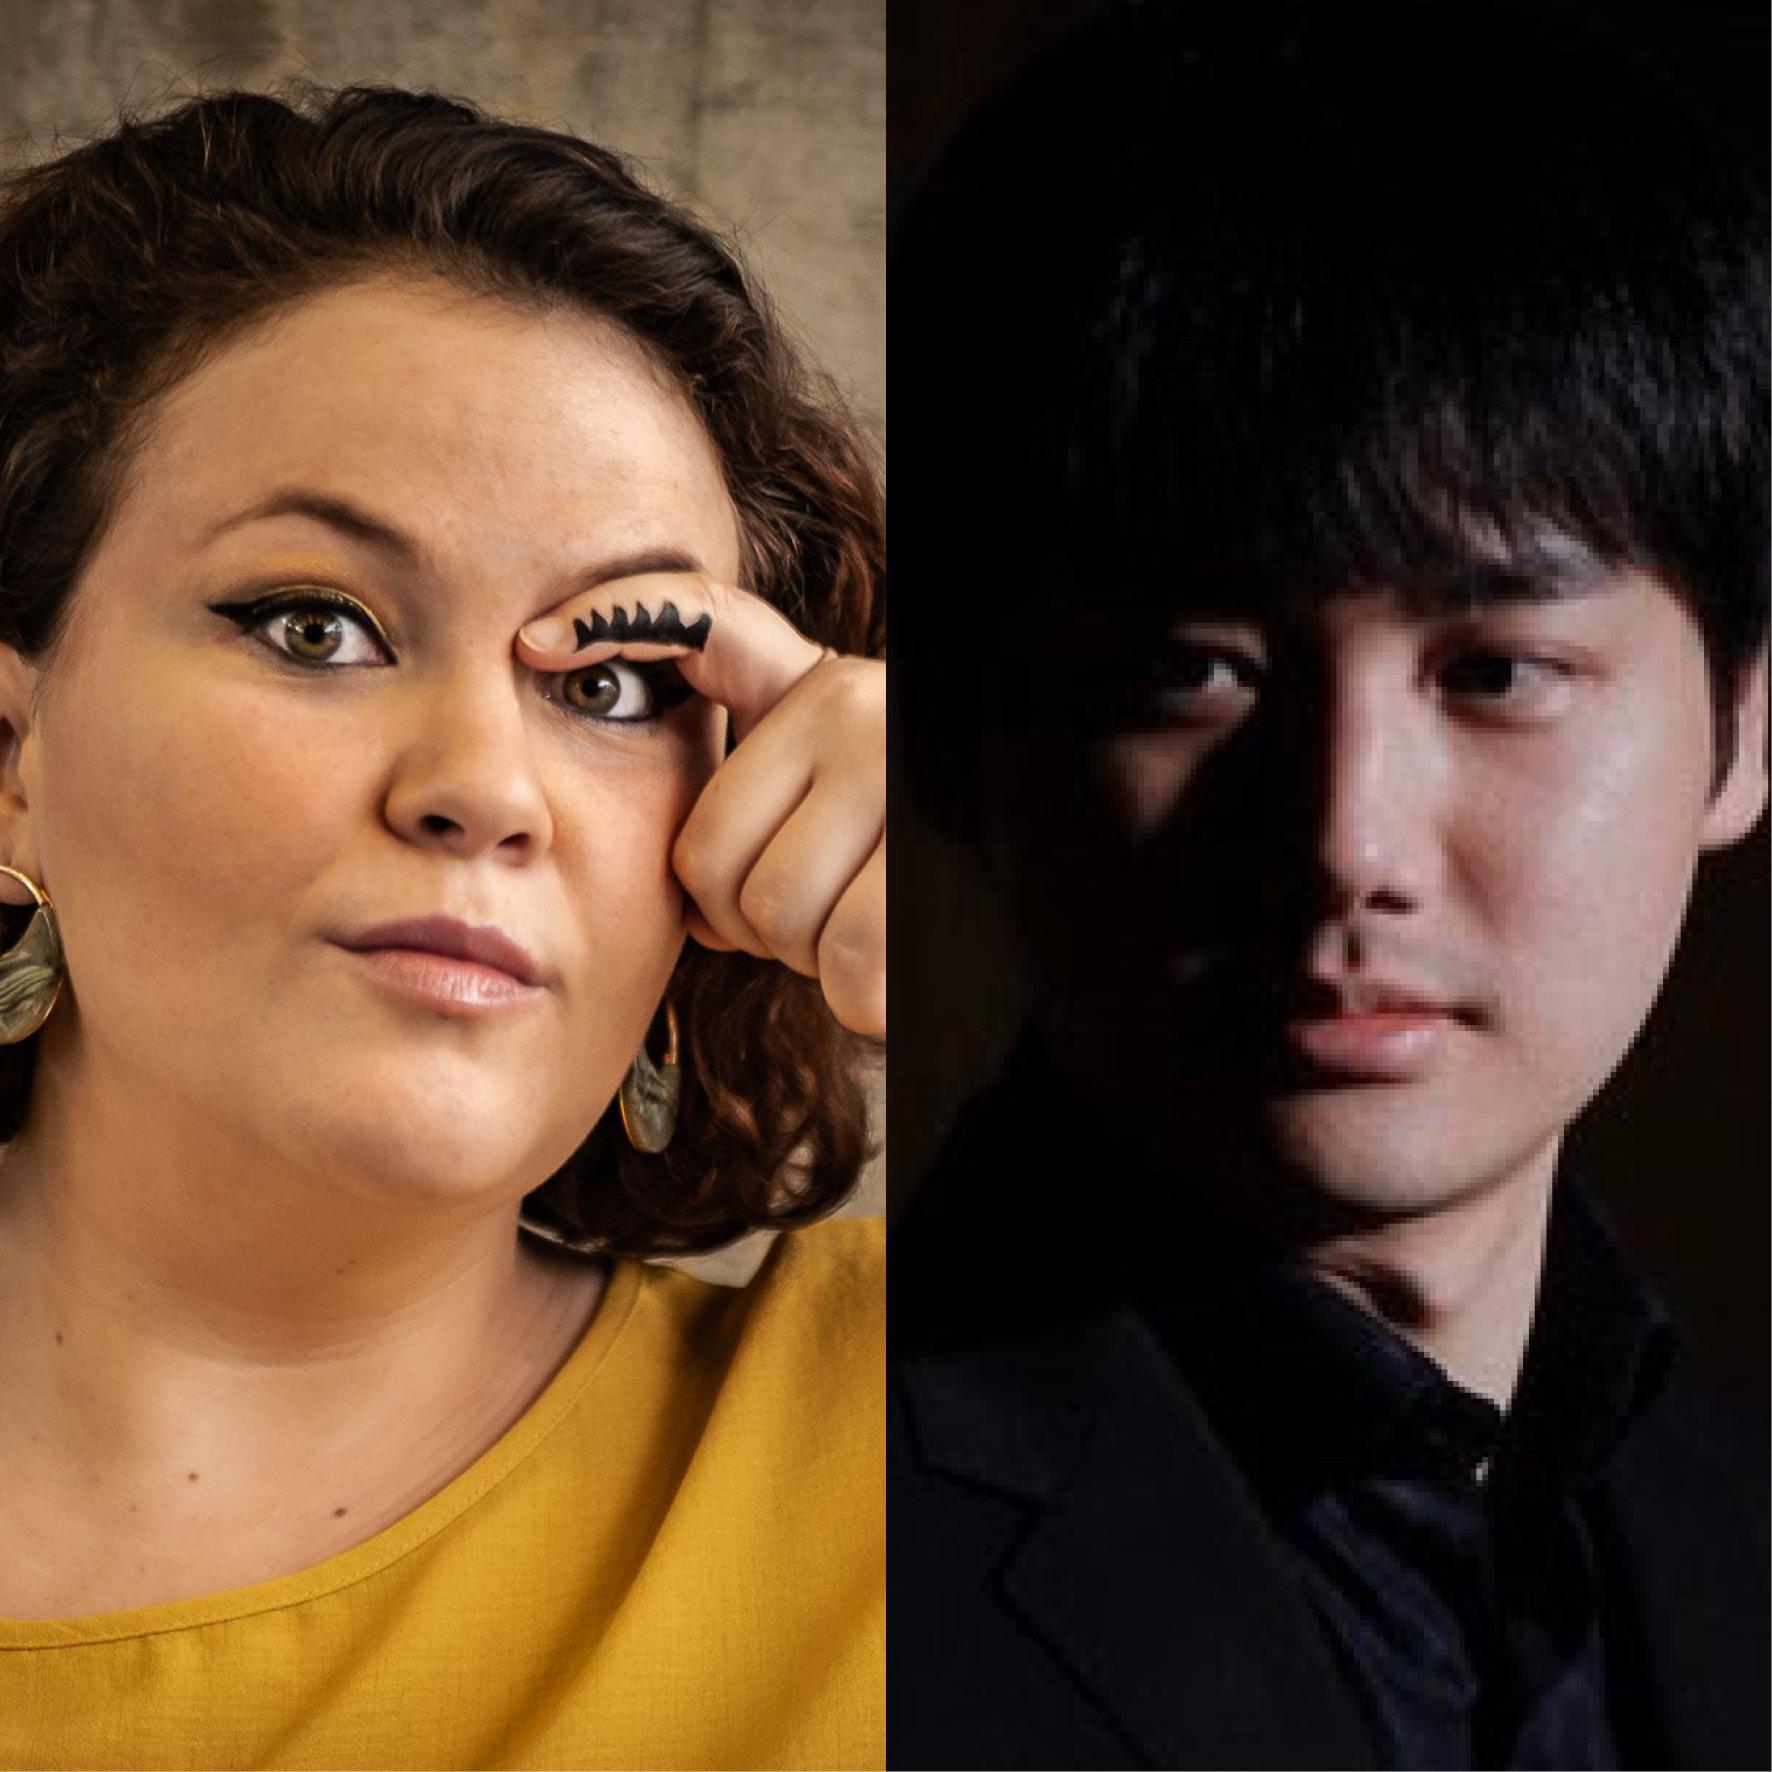 Duo 7: Andrea Conangla / Tatsuya Ohira